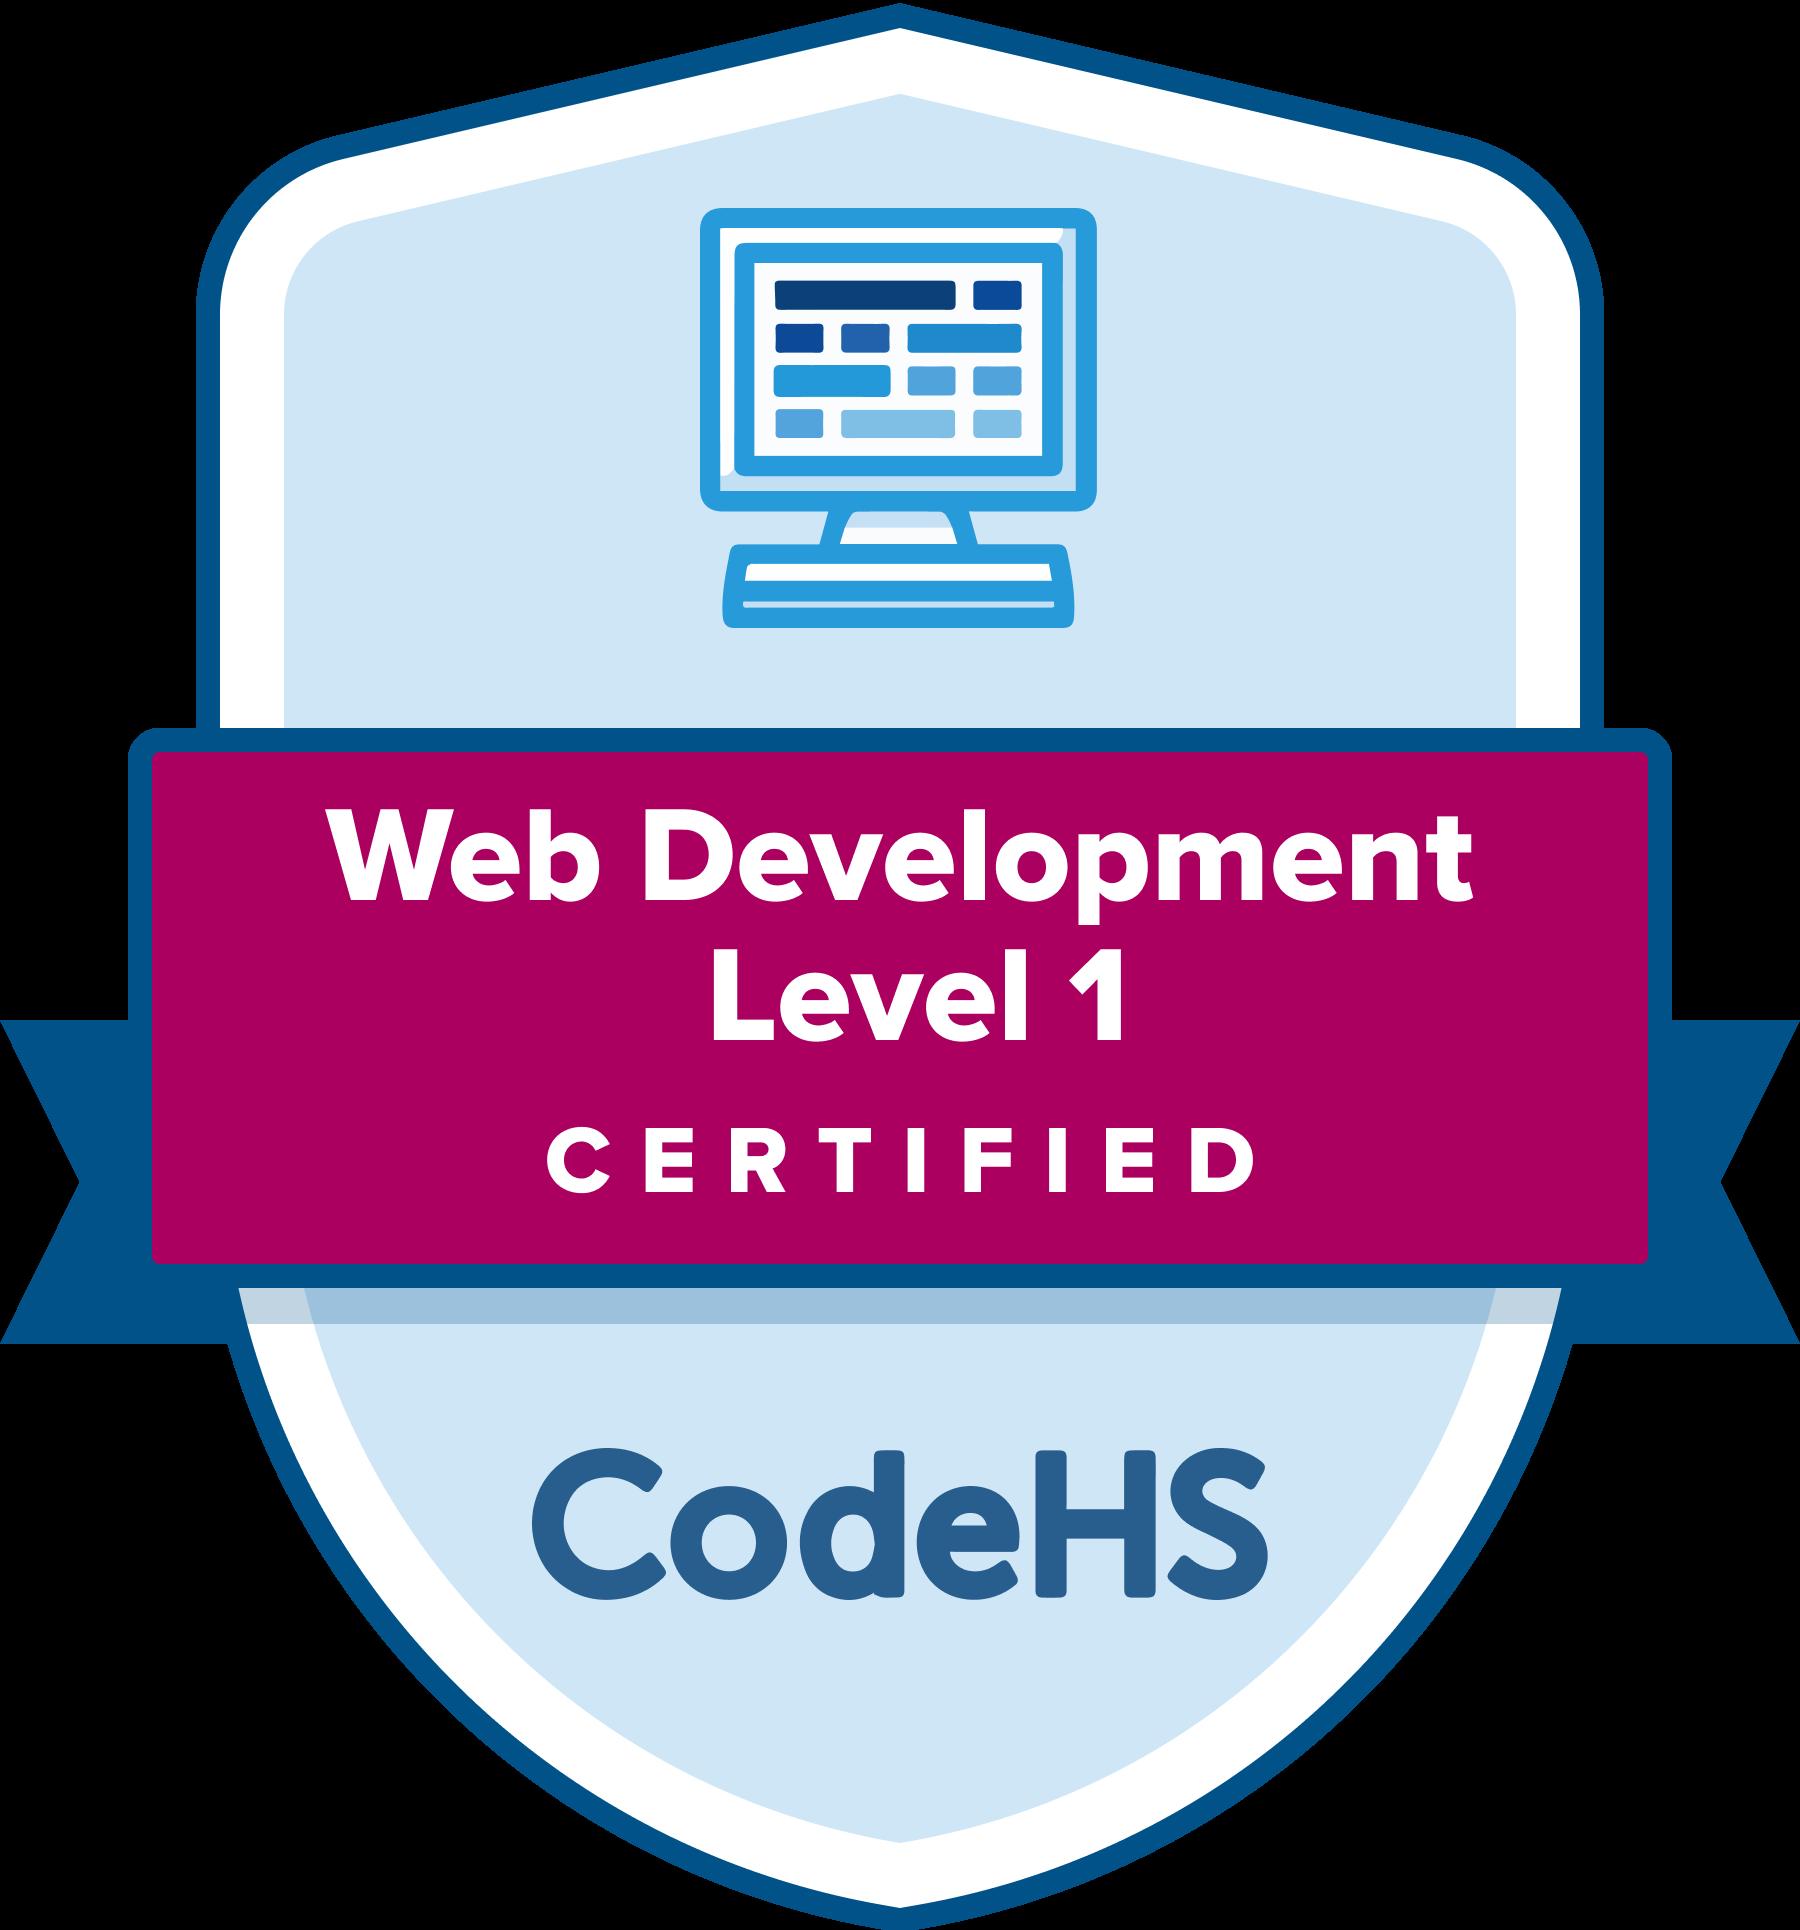 Web Development Certification Badge